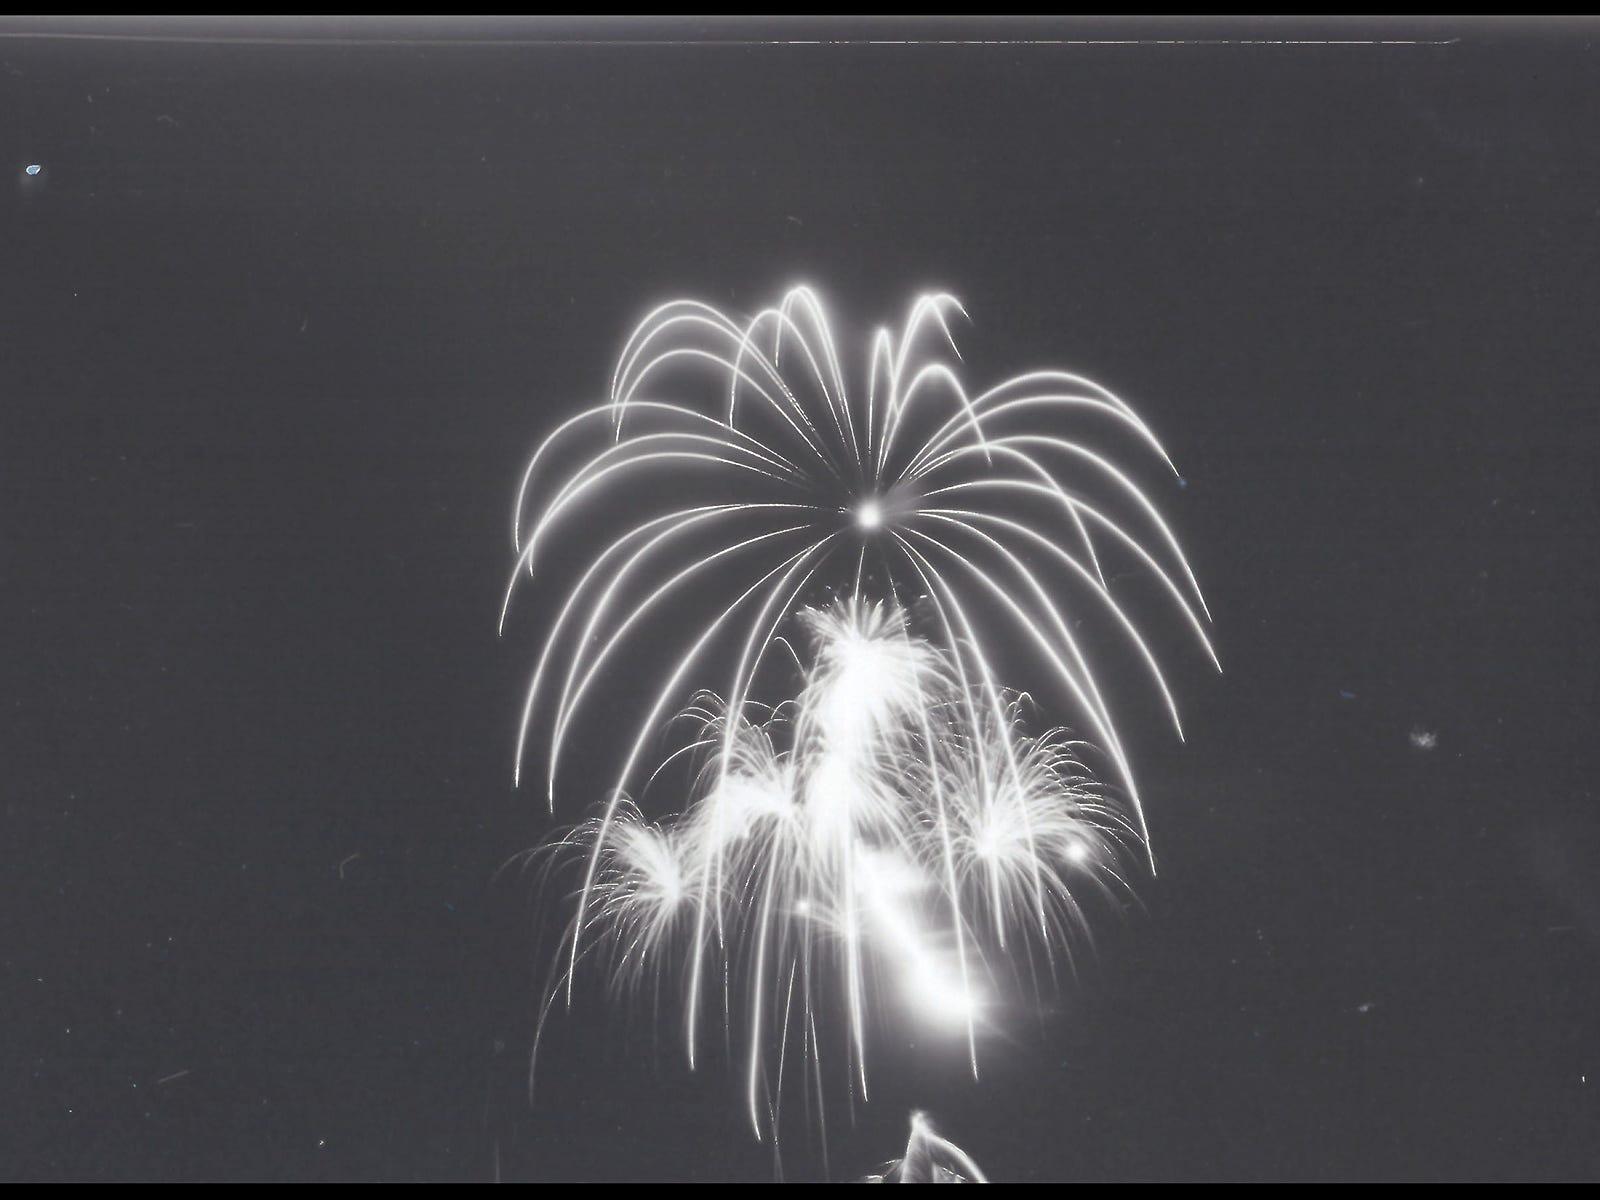 07/04/60Fireworks